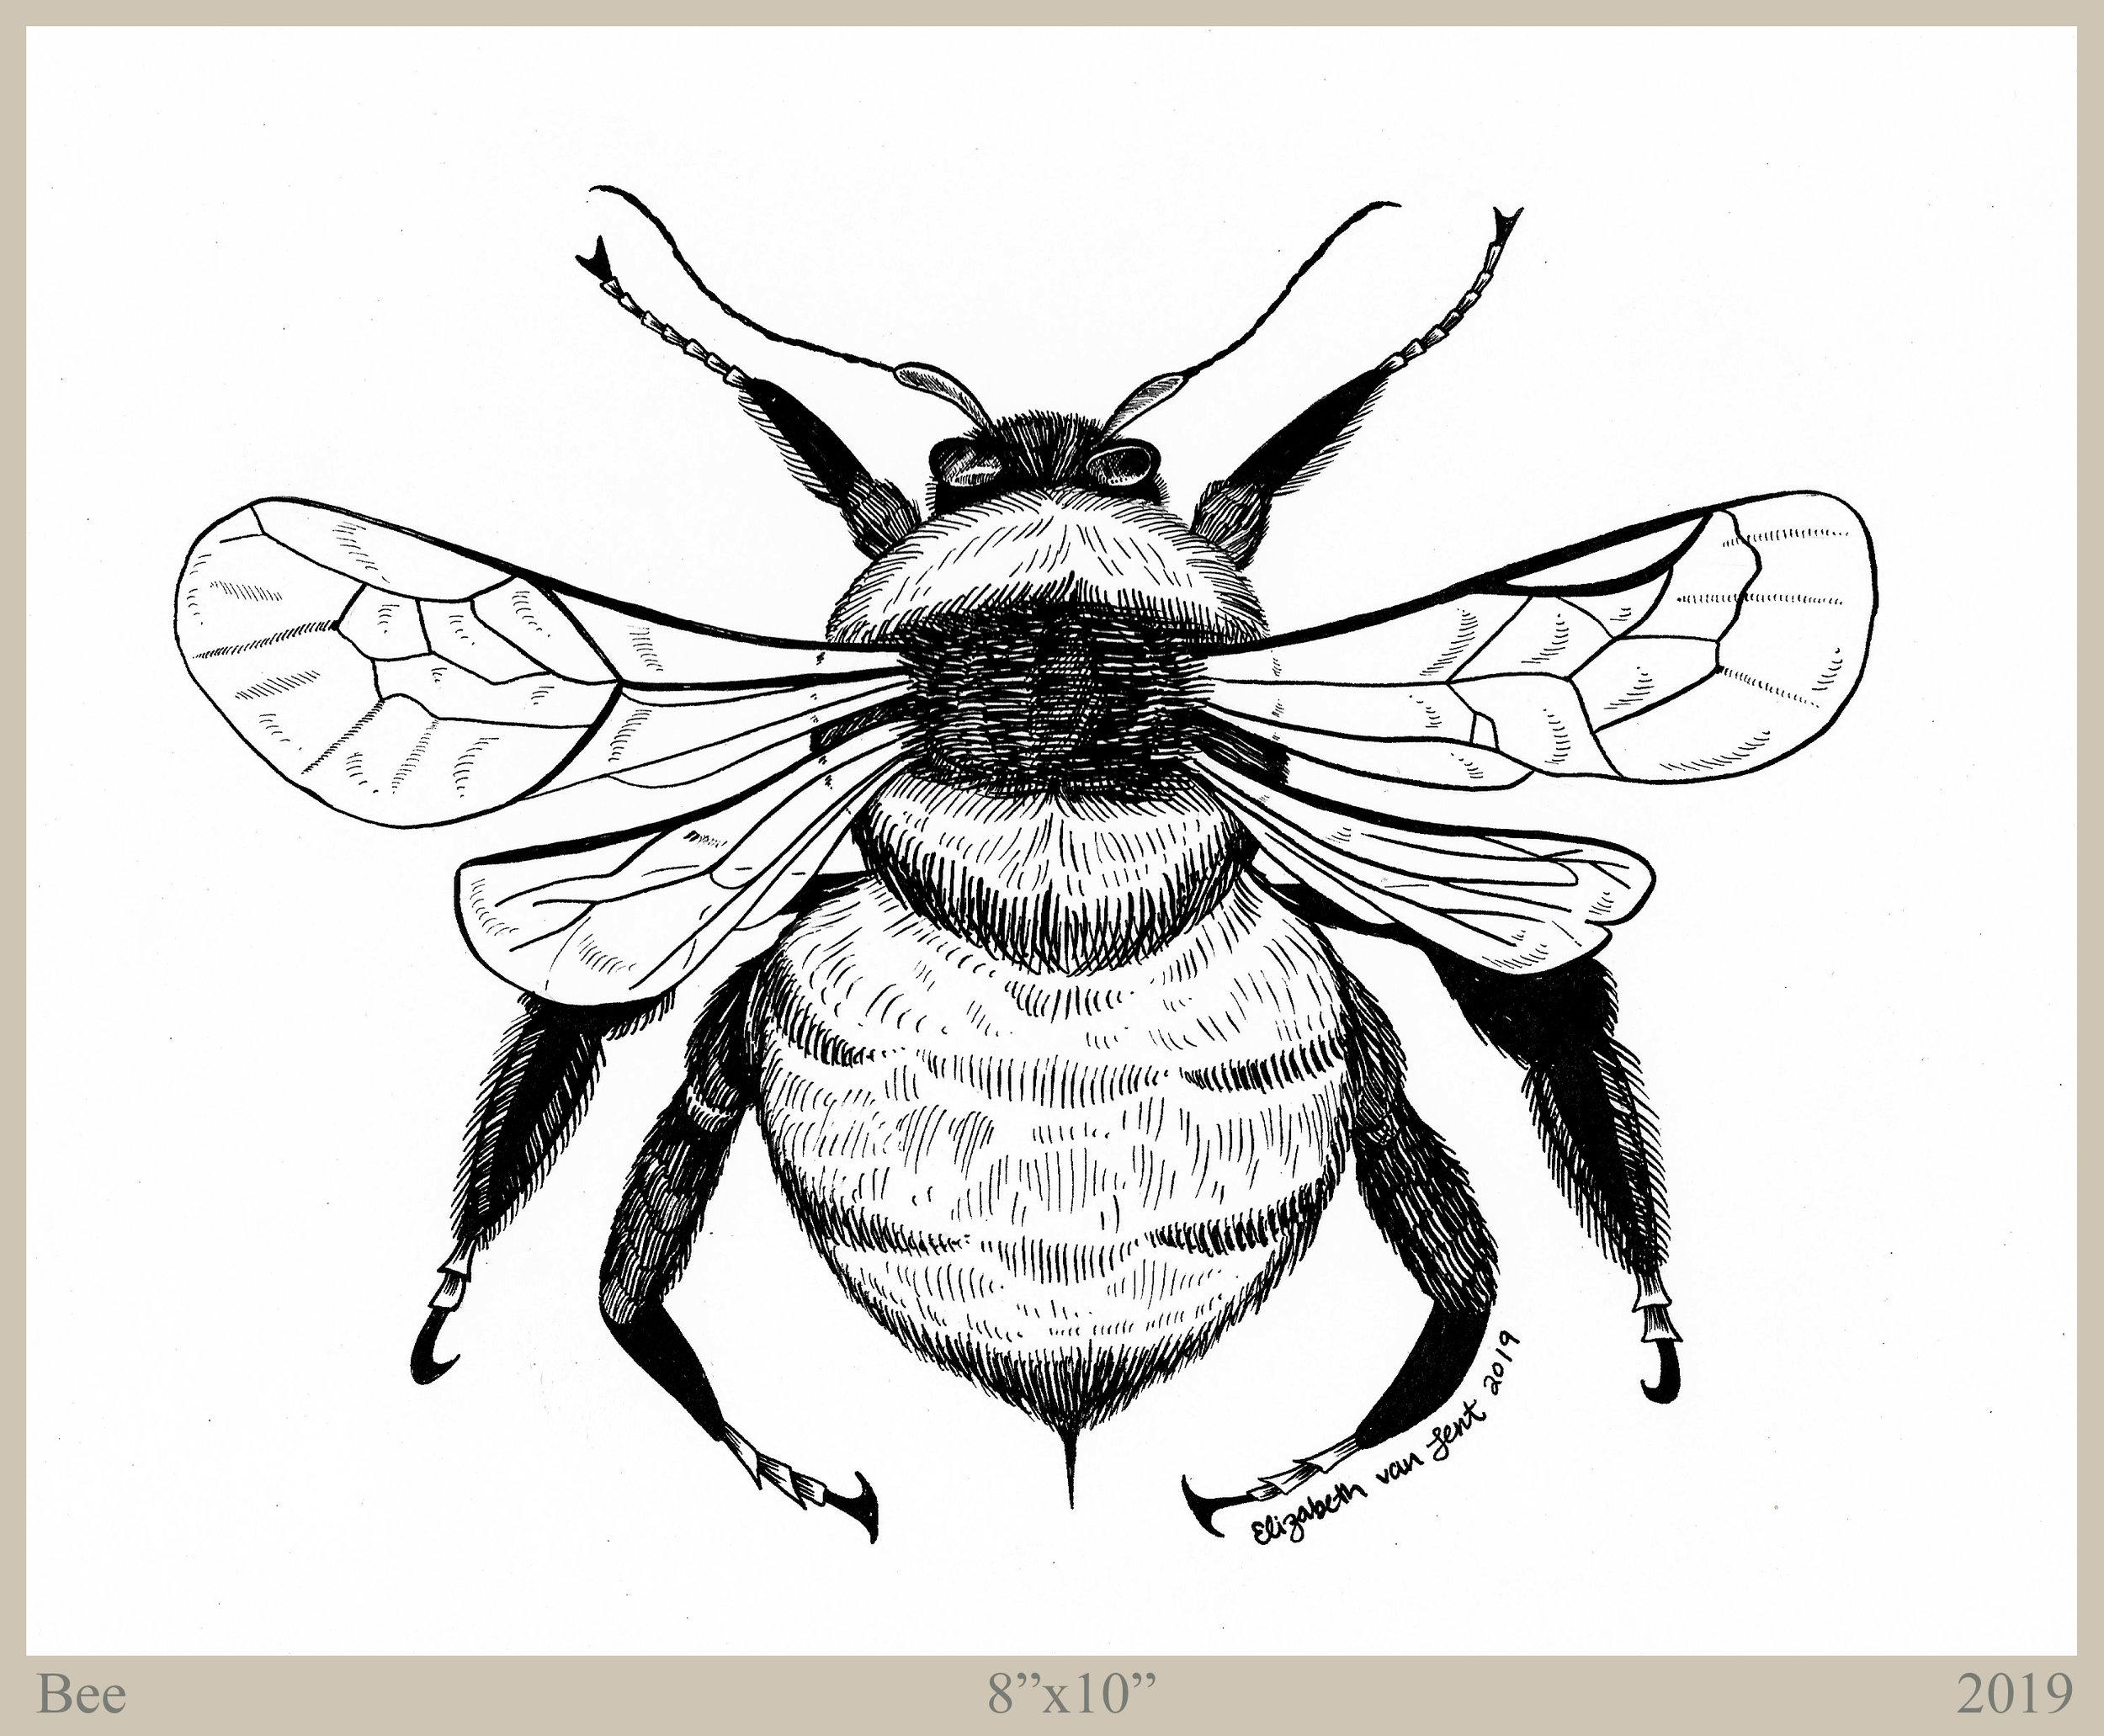 Bee_300_border_text.jpg